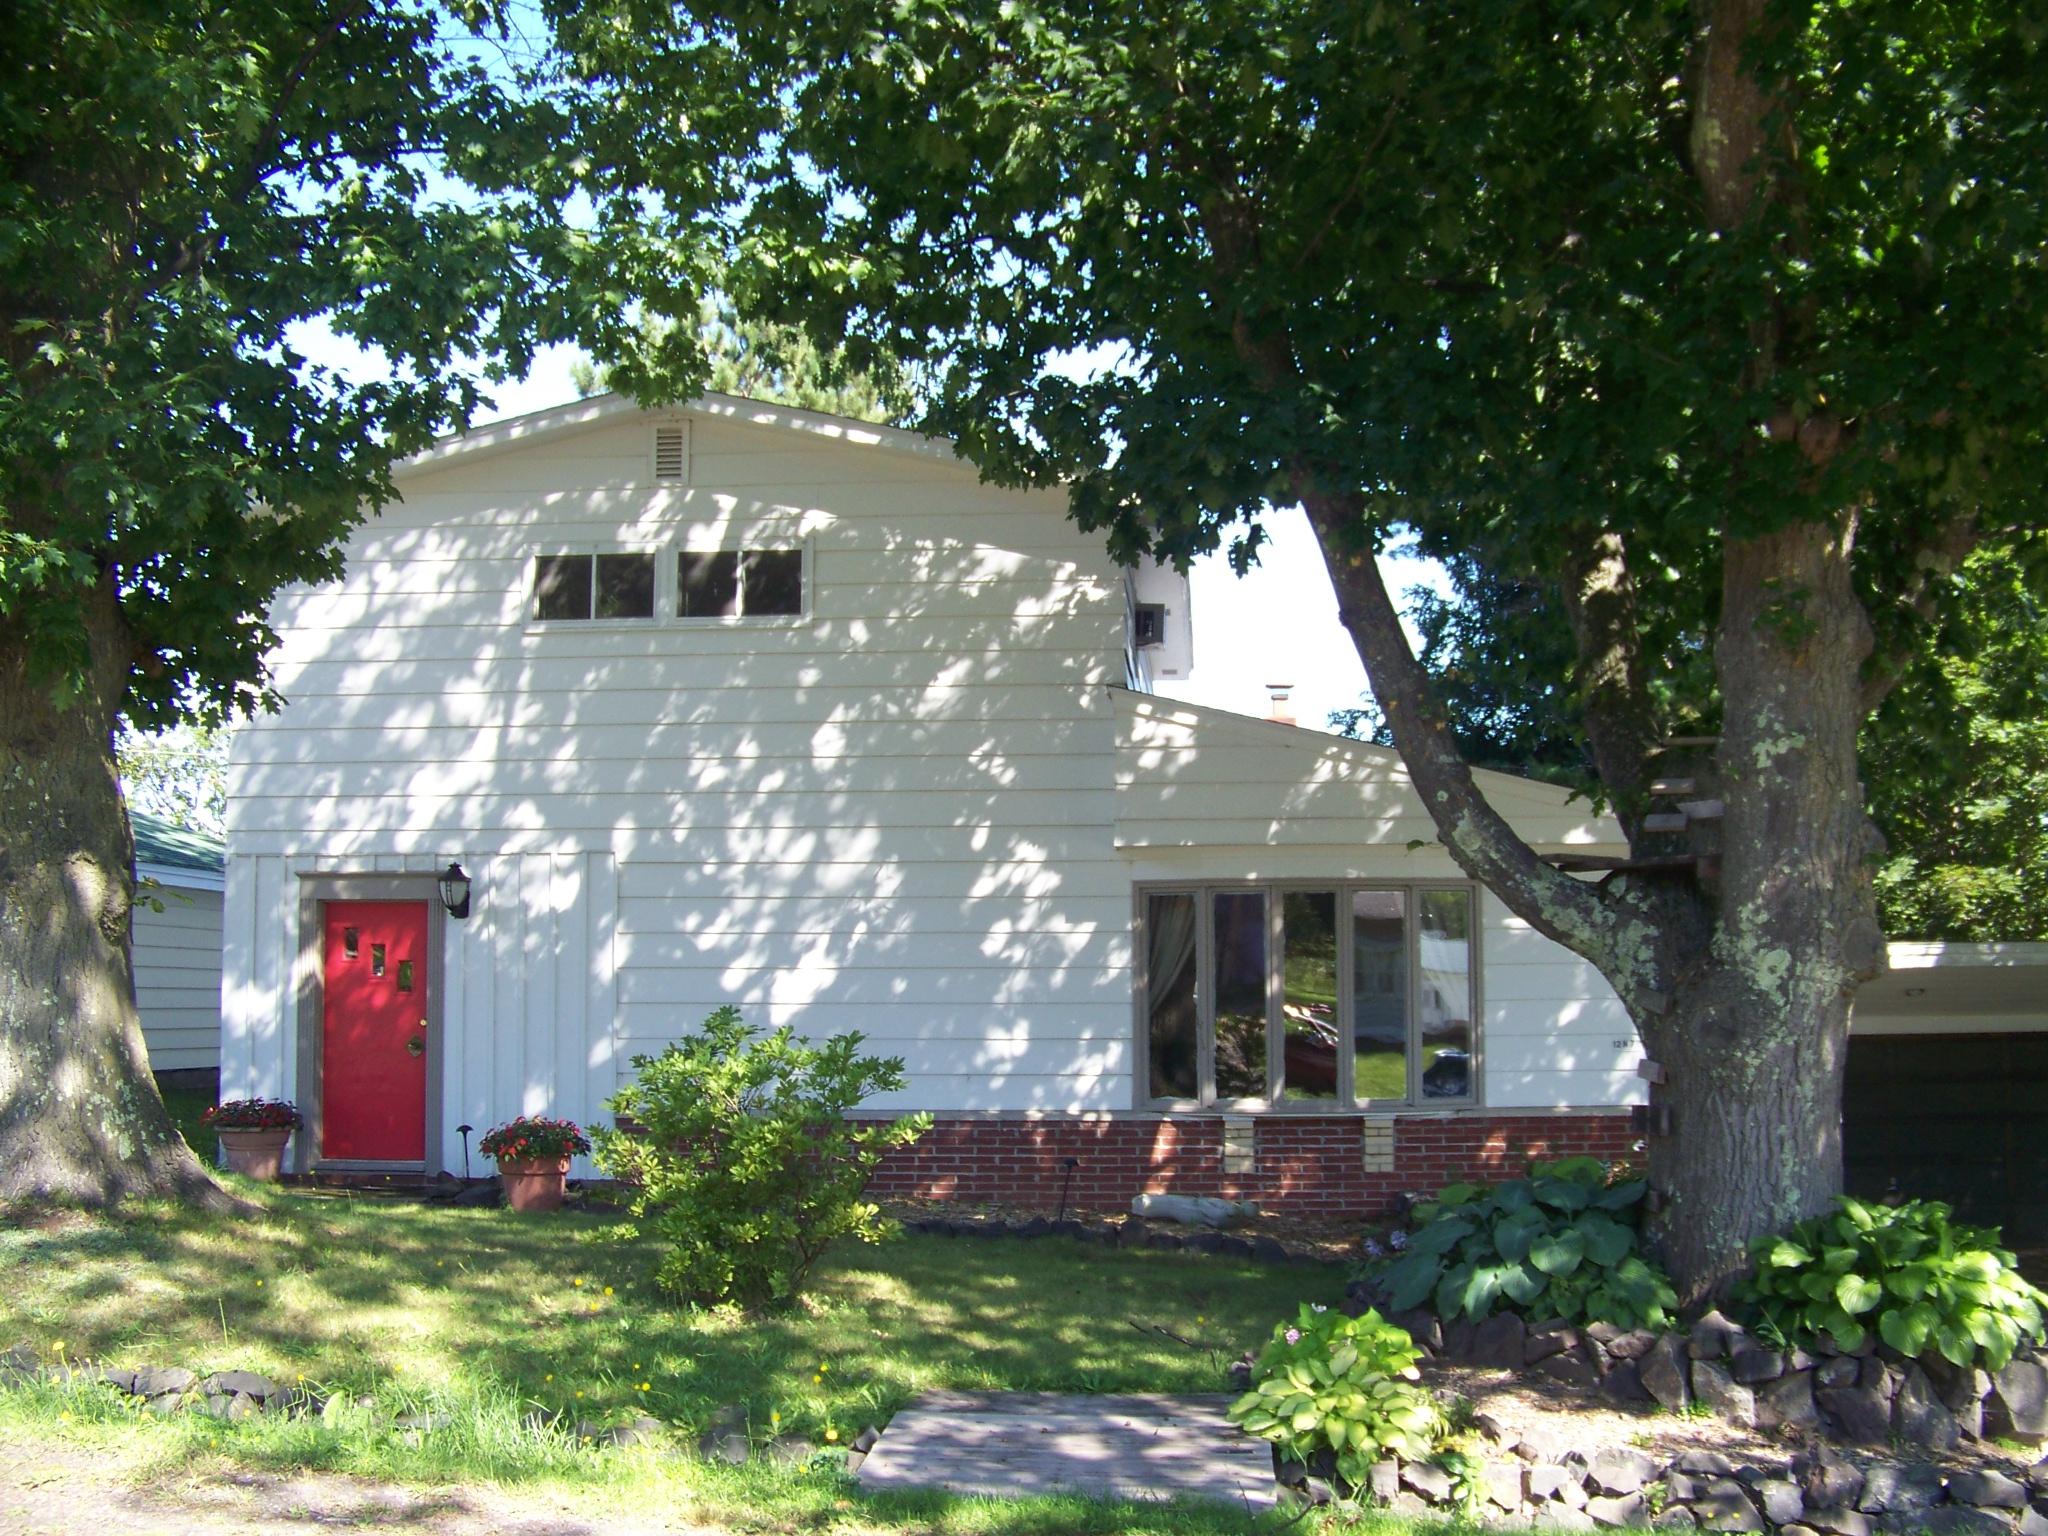 12 N 7th Street, Bayfield, Wisconsin 54814